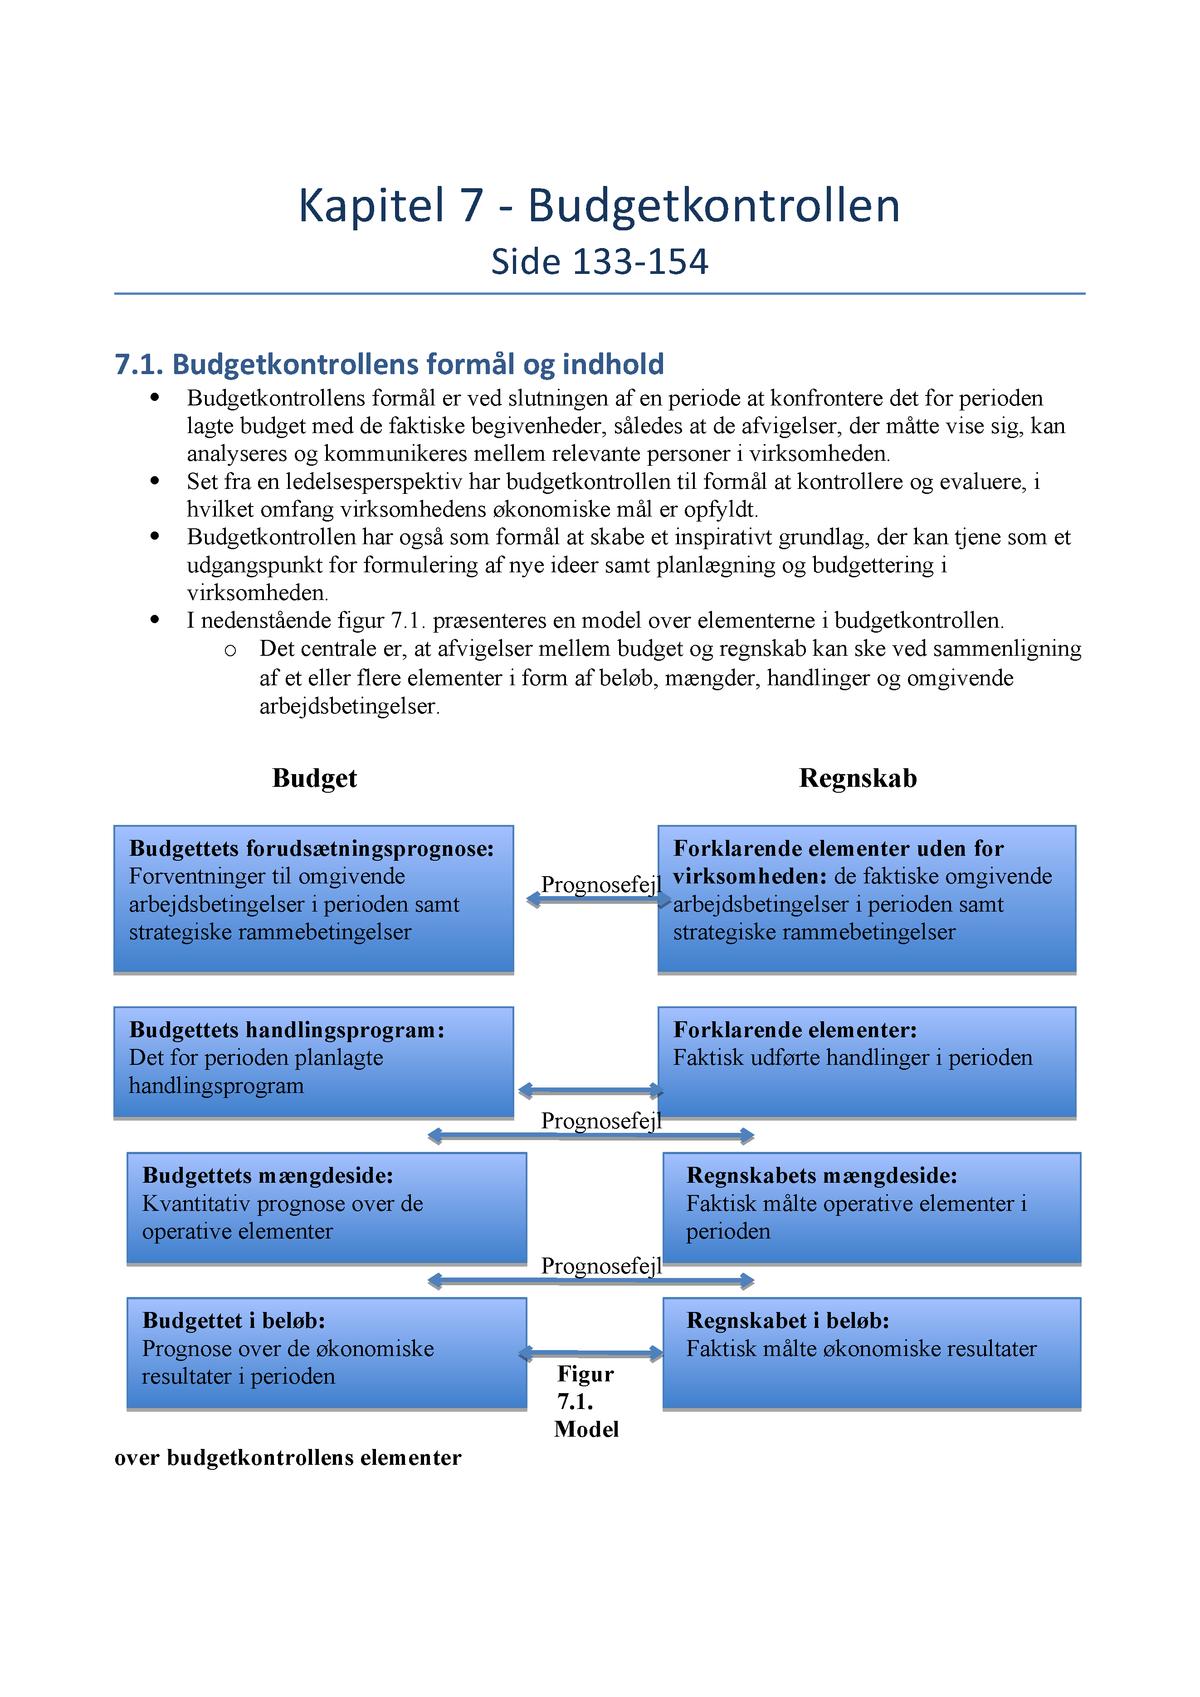 a5f03f25d34 Kapitel 7 - Budgetkontrollen - Økonomistyring - StuDocu